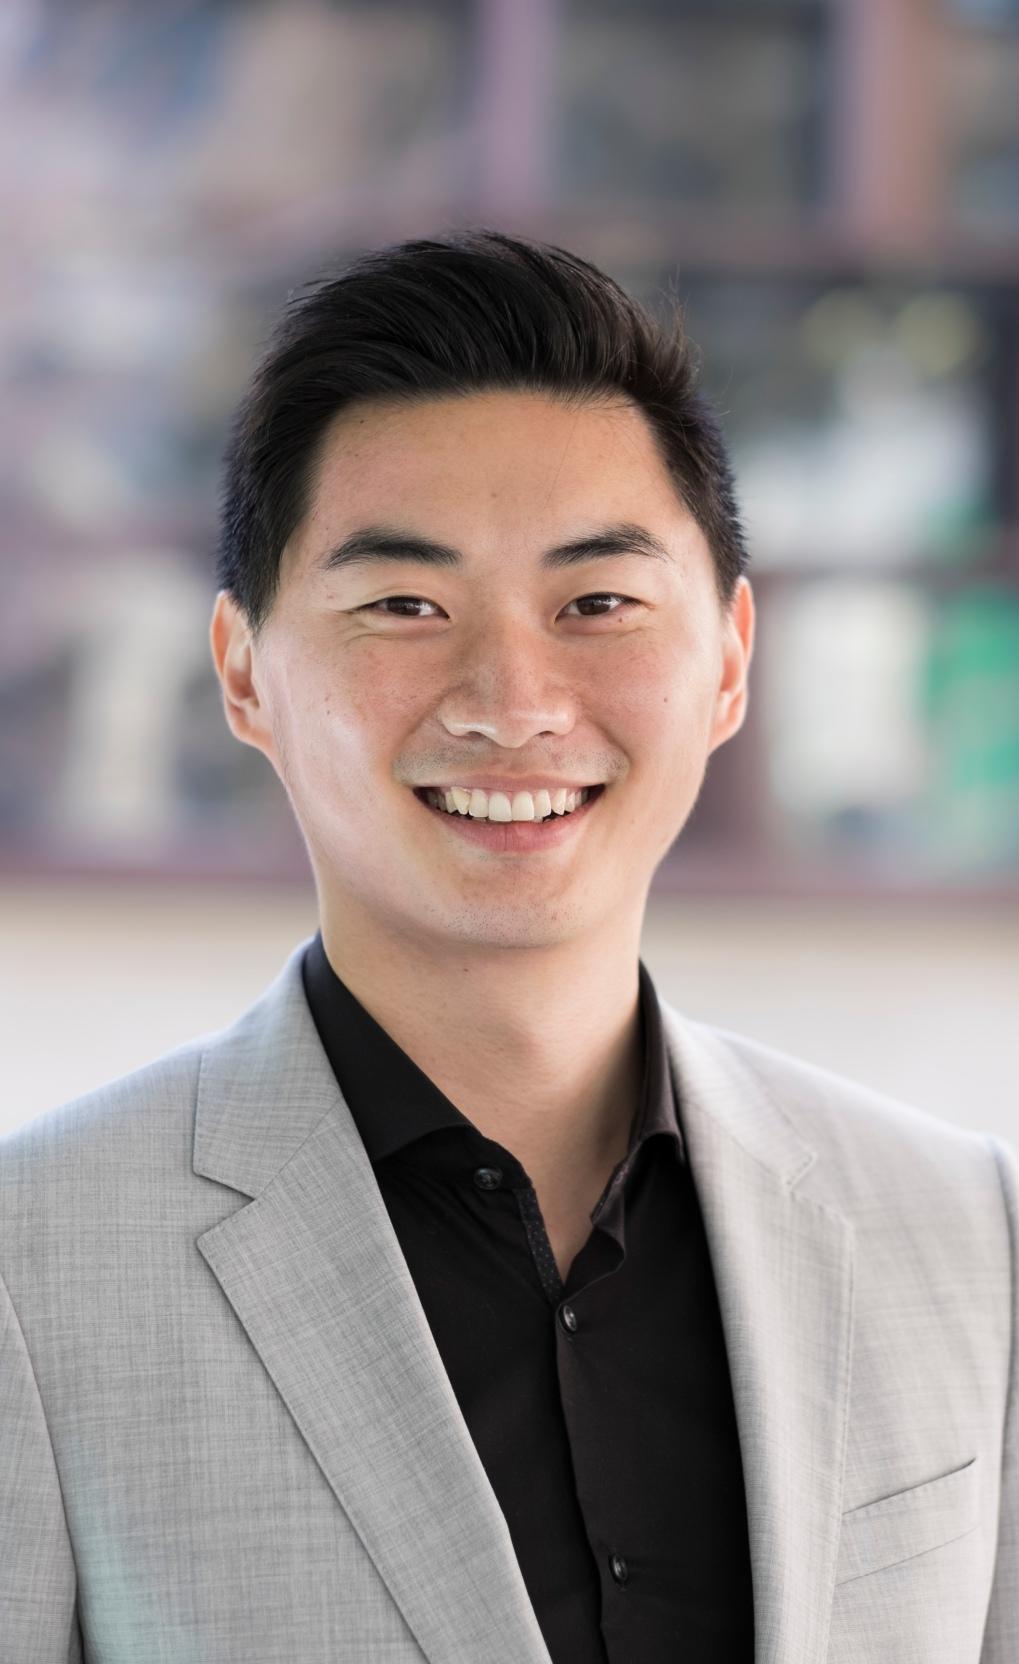 Managing Director of the Auranga Development - Charles Ma. Source: Auranga